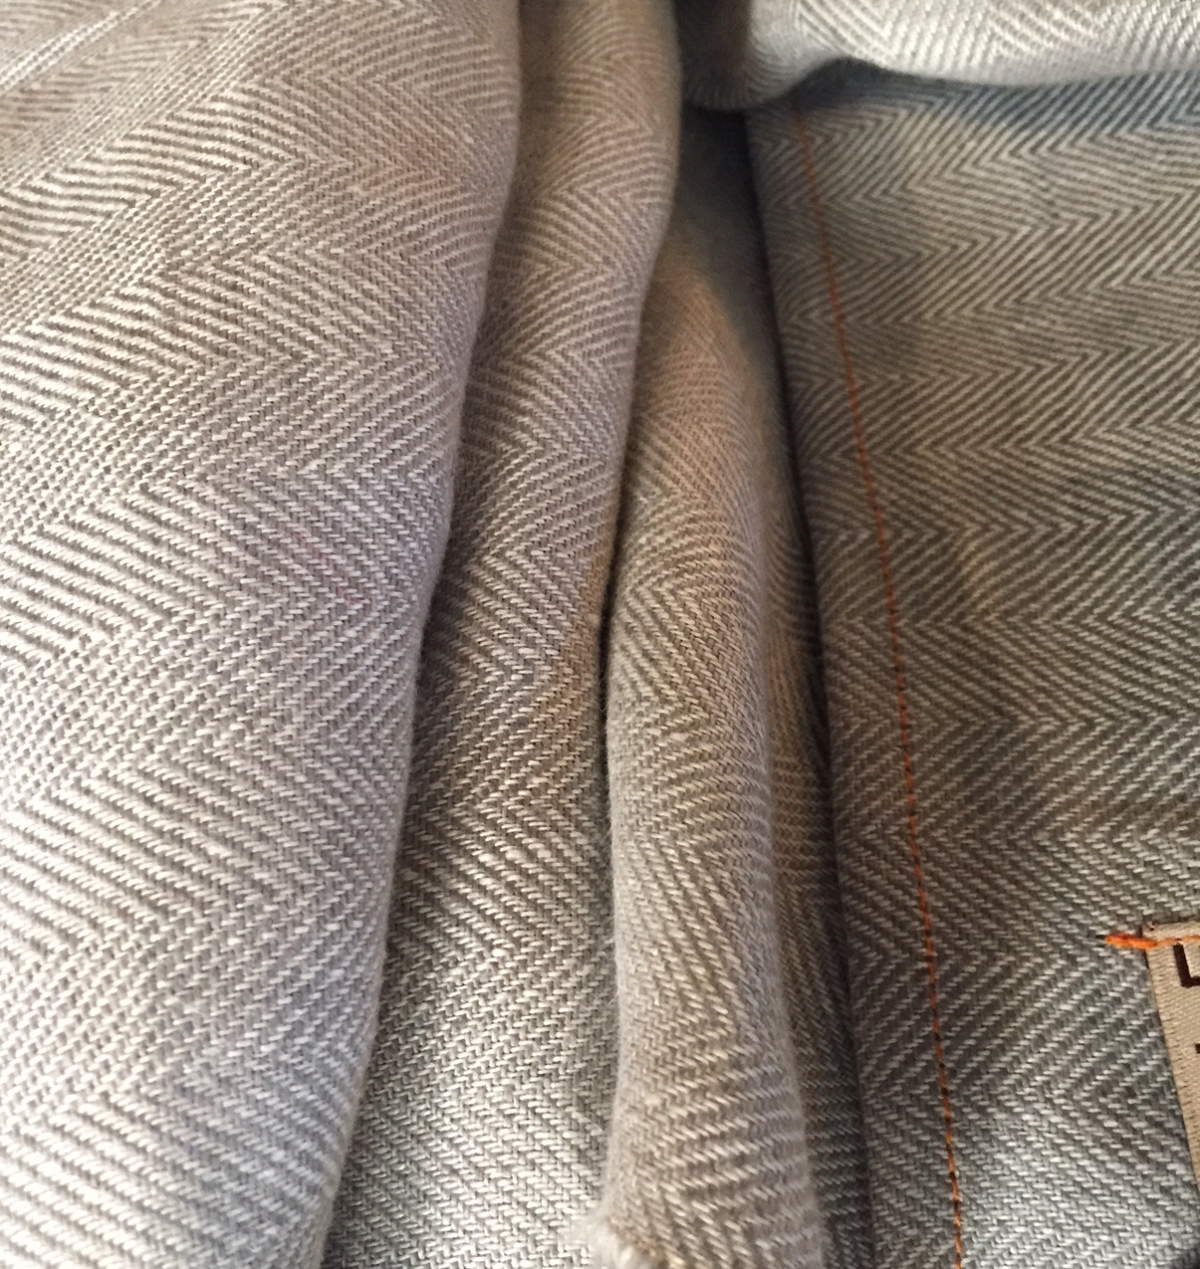 tx-irish linen herringbone scarf@artefacthome